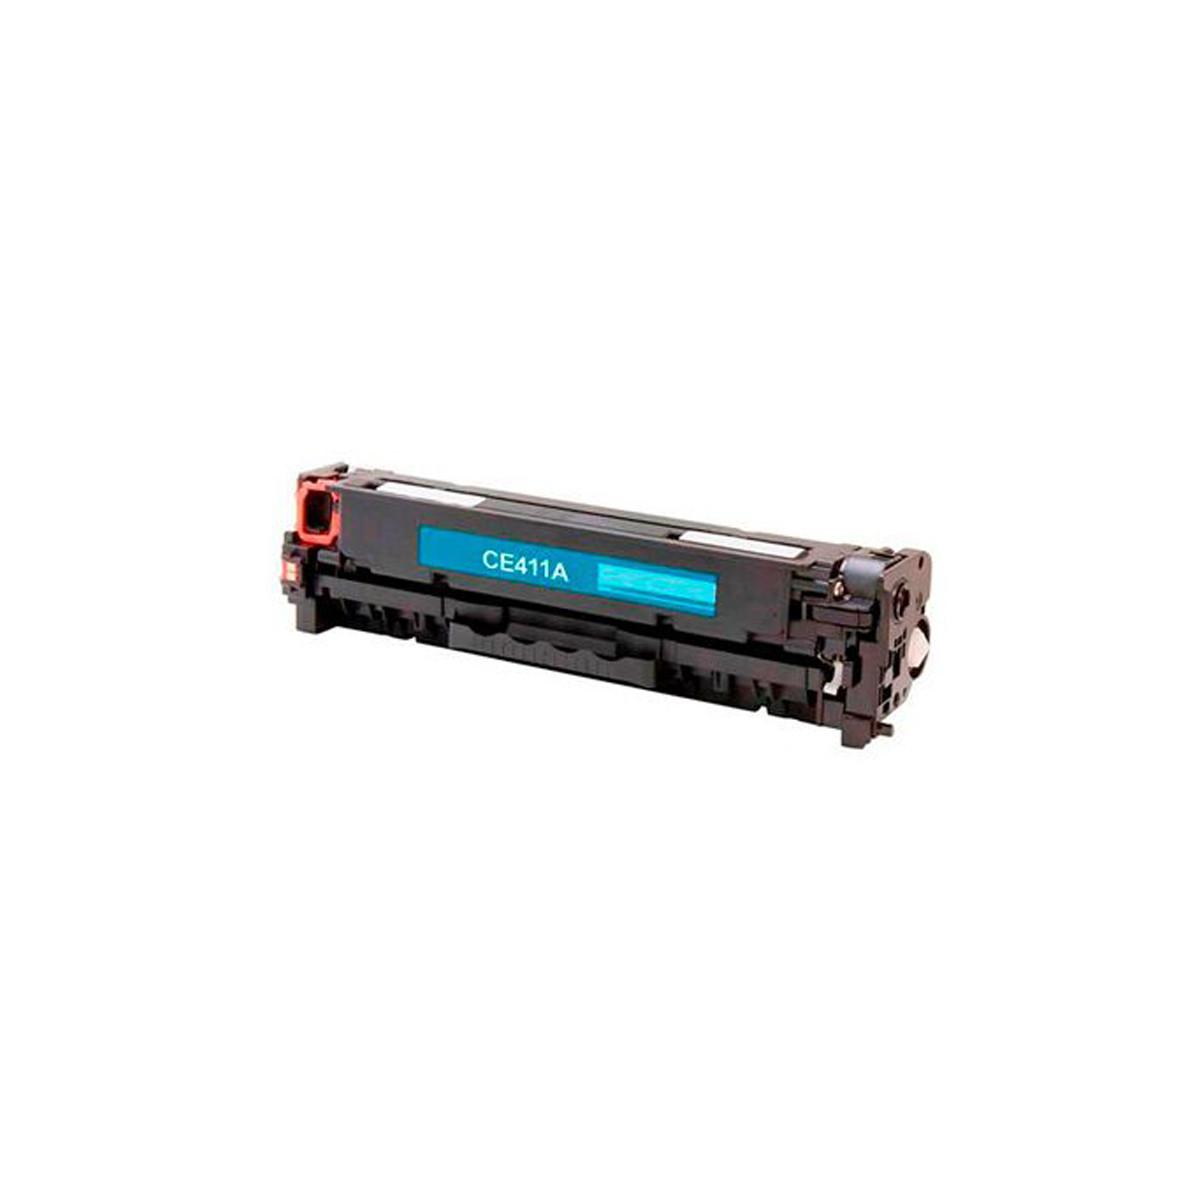 Toner Compatível com HP CE411A 305A Ciano   M451 M475 M375 M451DW M451NW M475DW   Eagle 2.6k